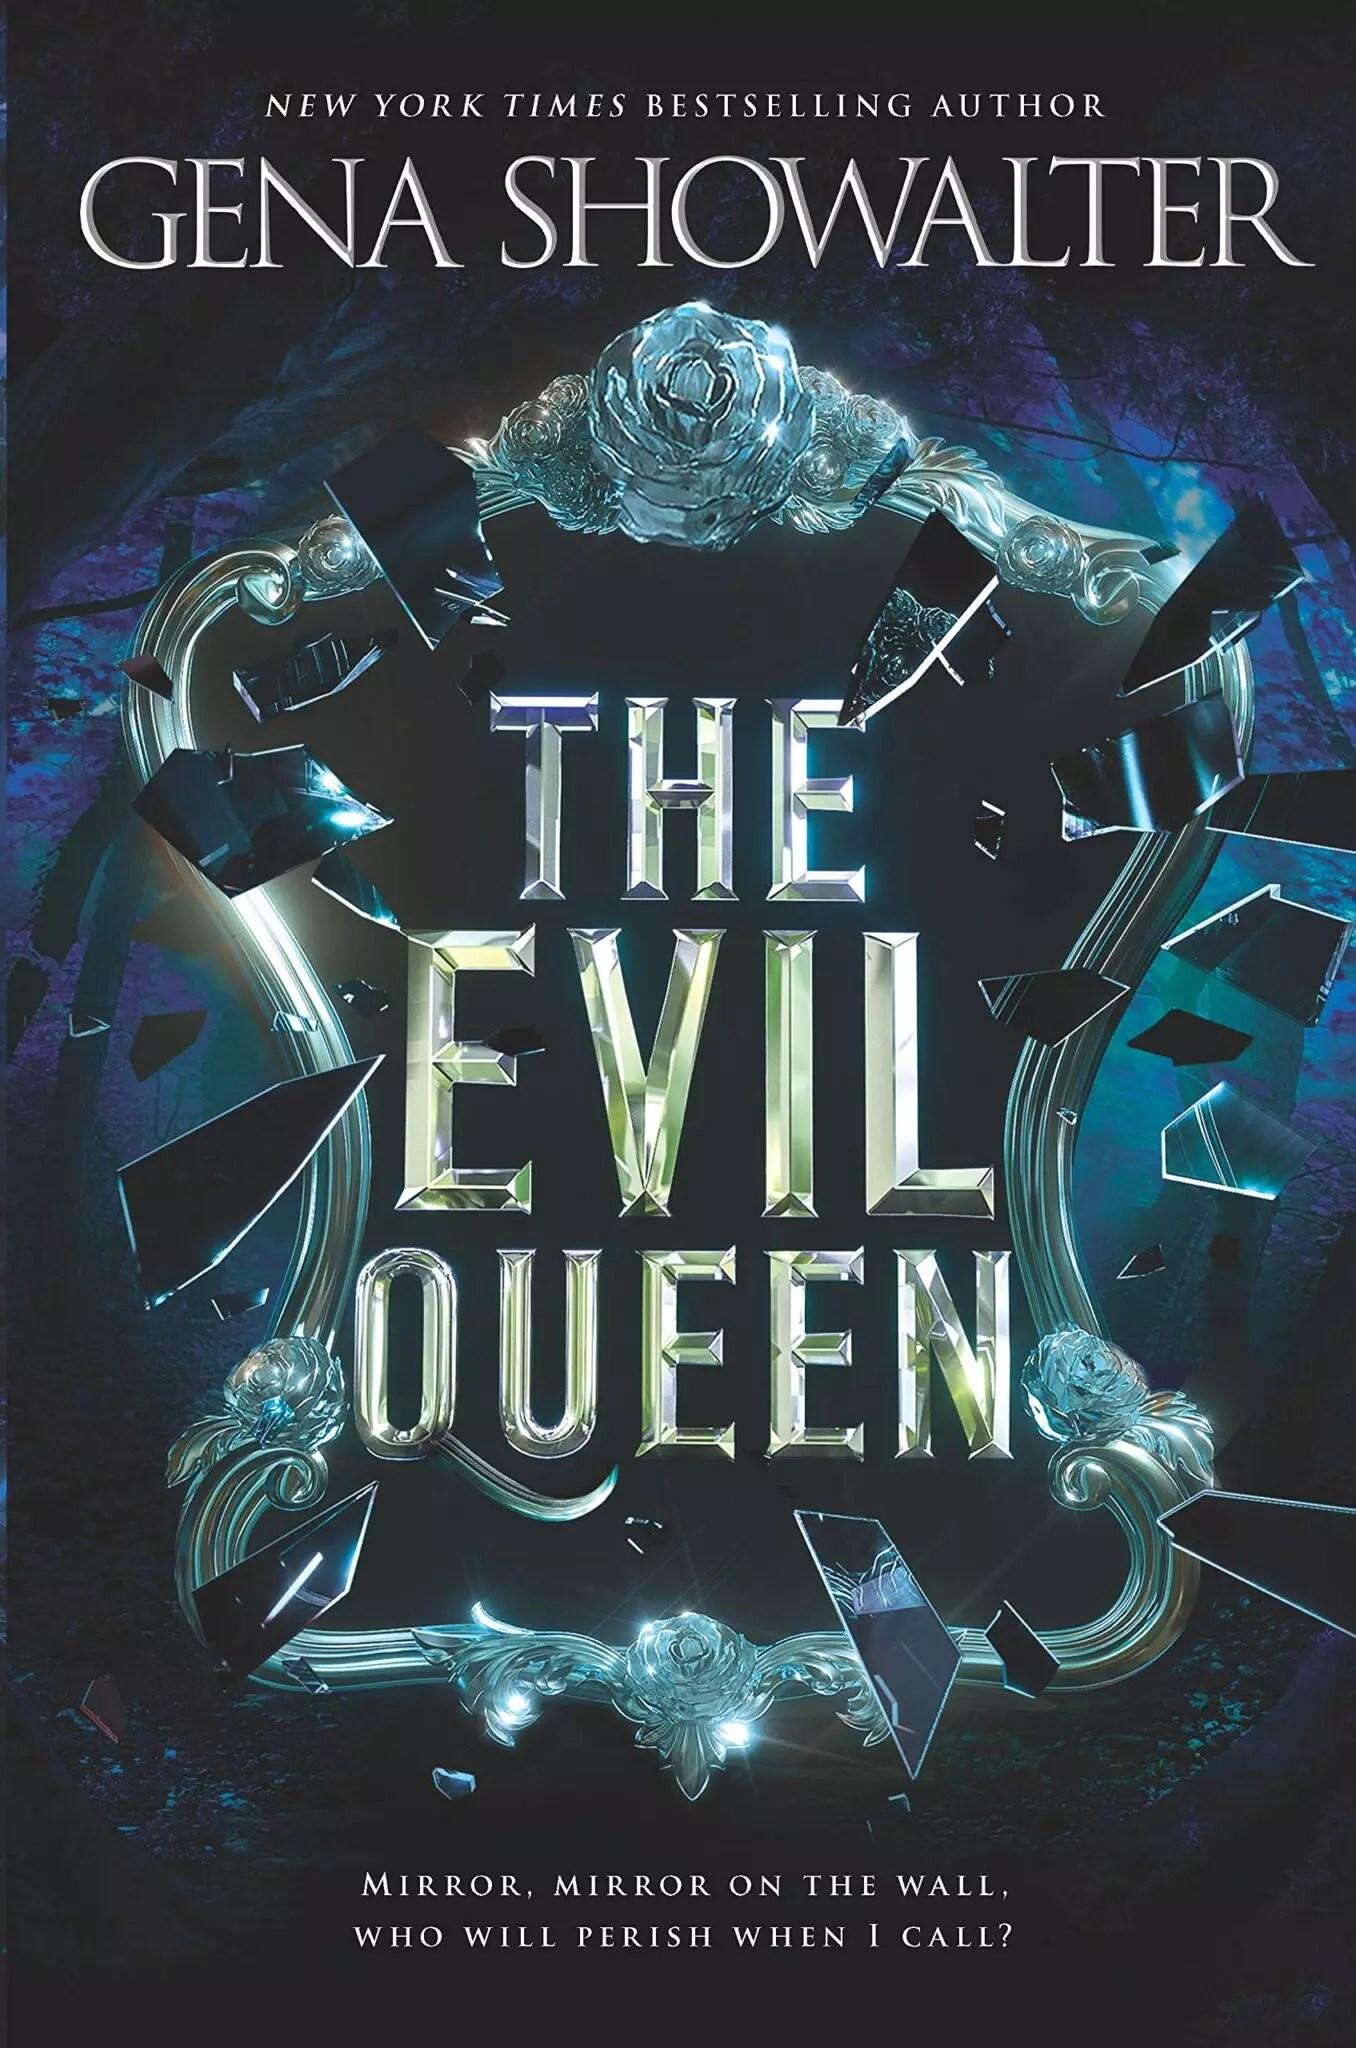 Gena Showalter The Evil Queen US cover